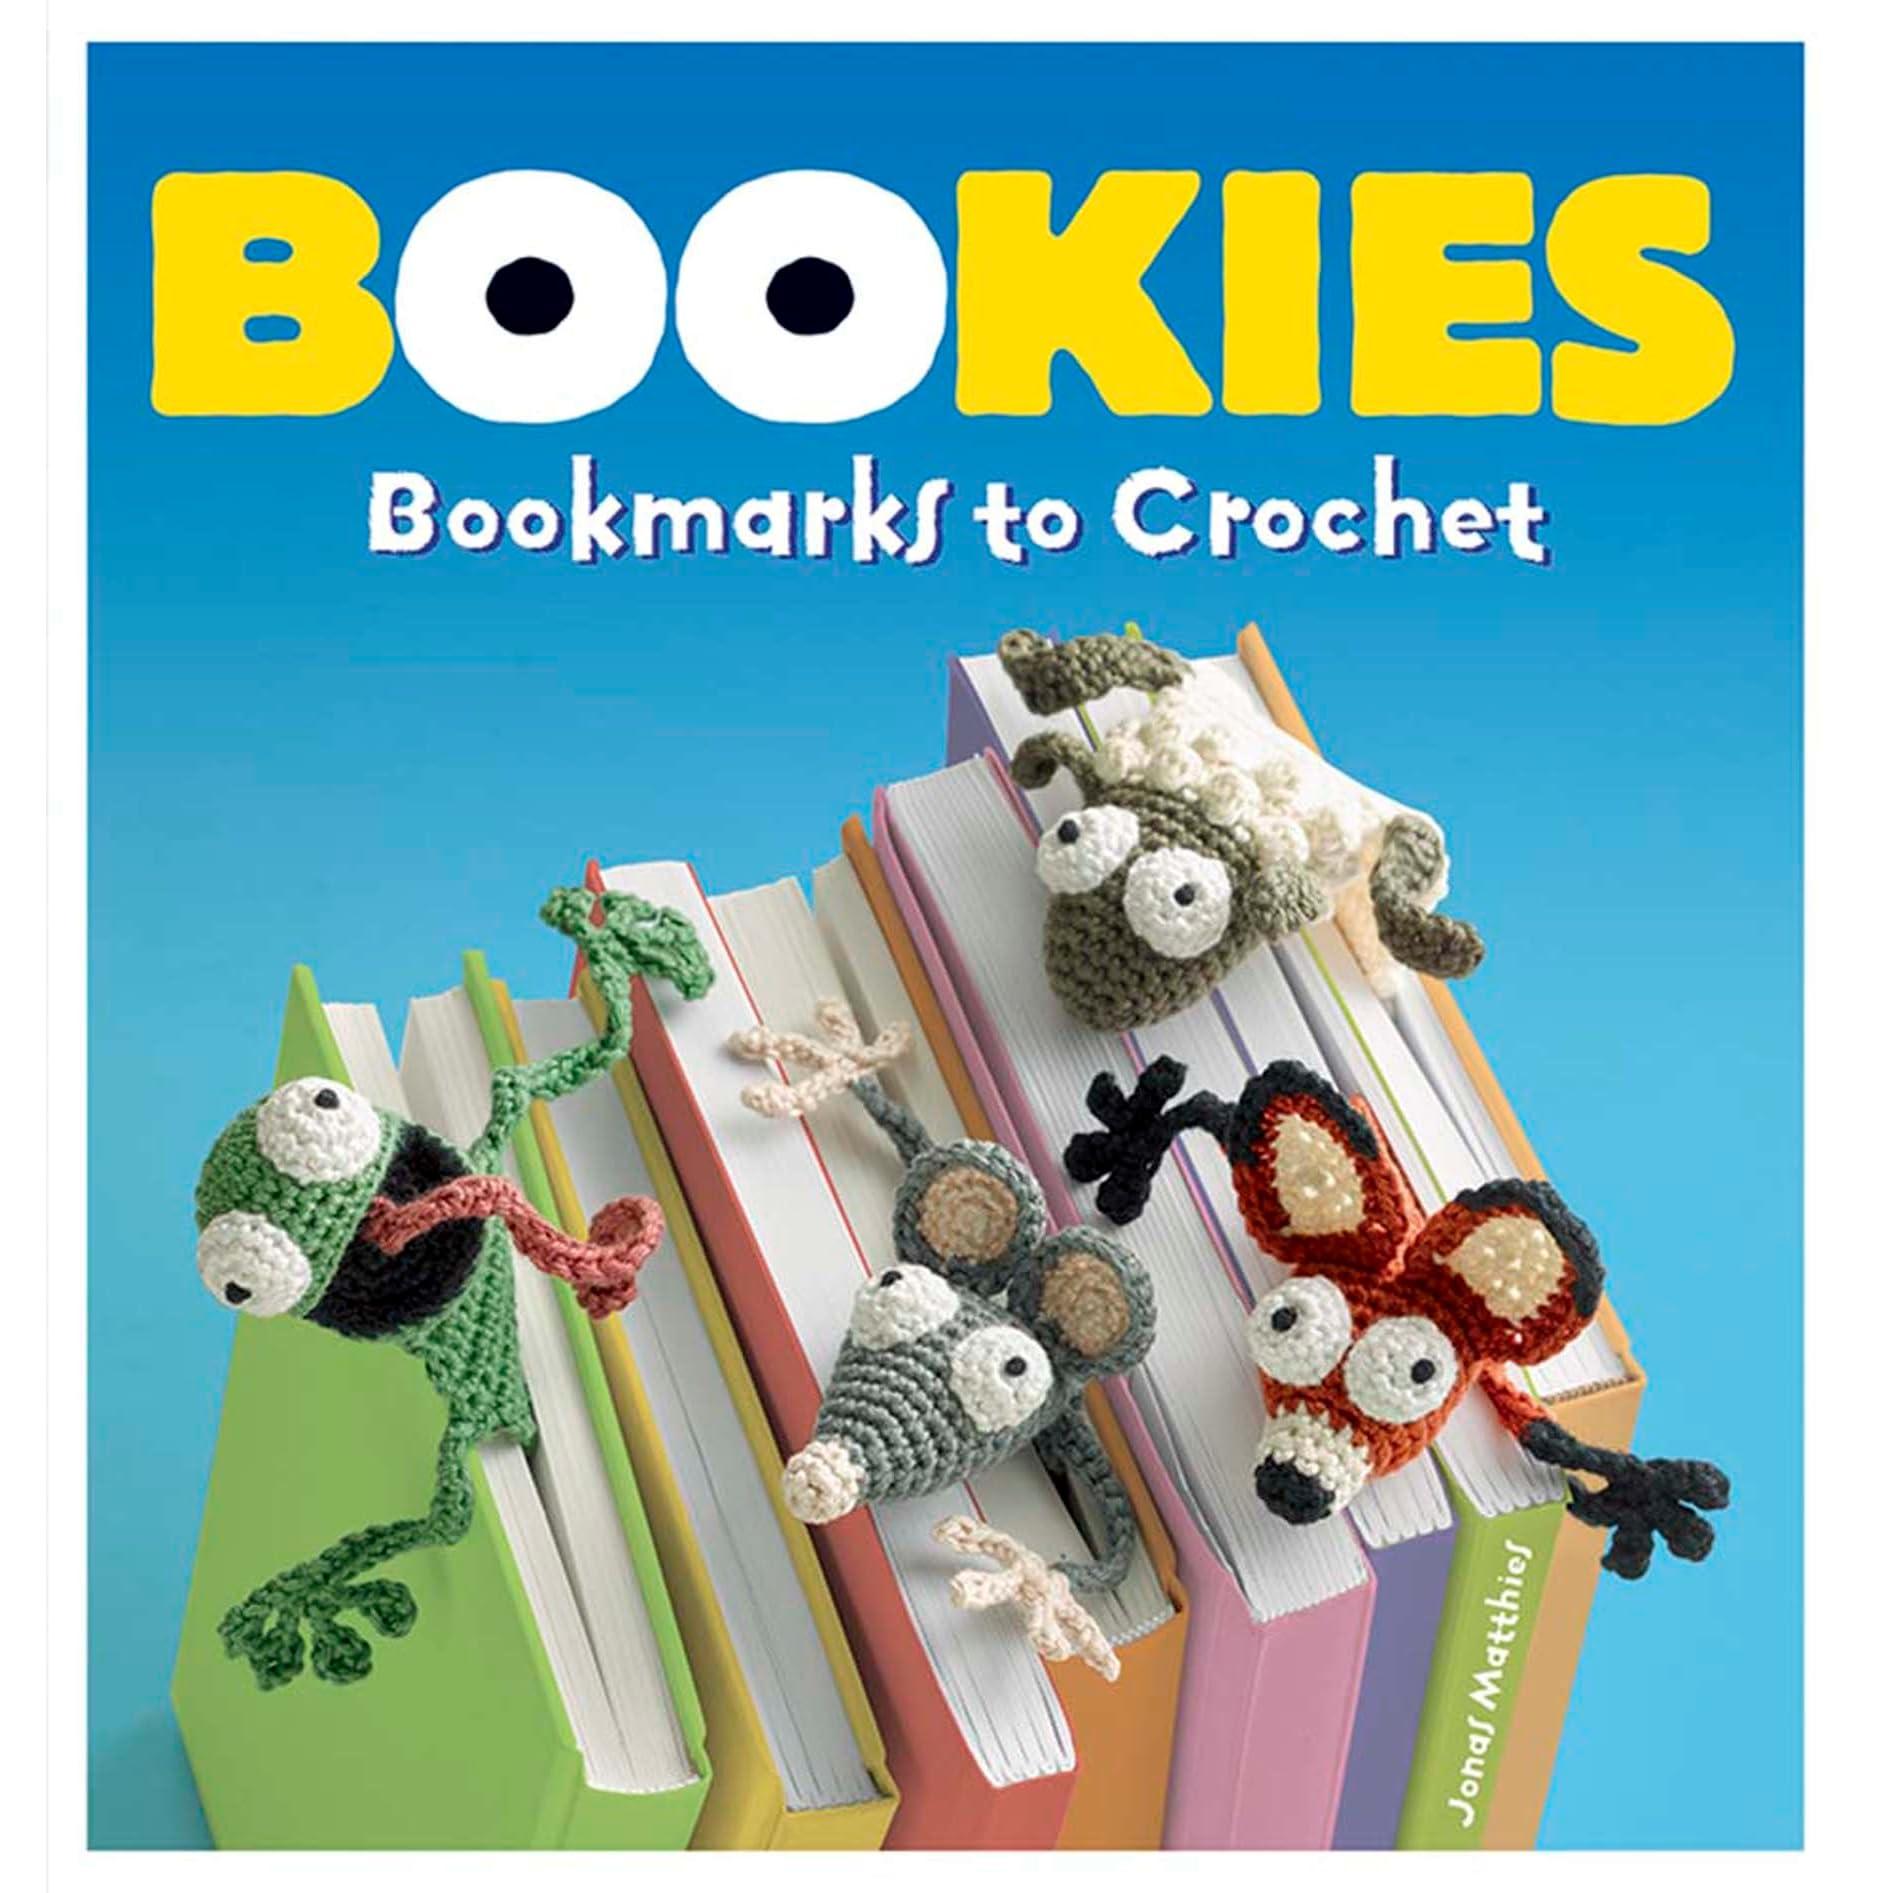 Bookies Bookmarks To Crochet By Jonas Matthies